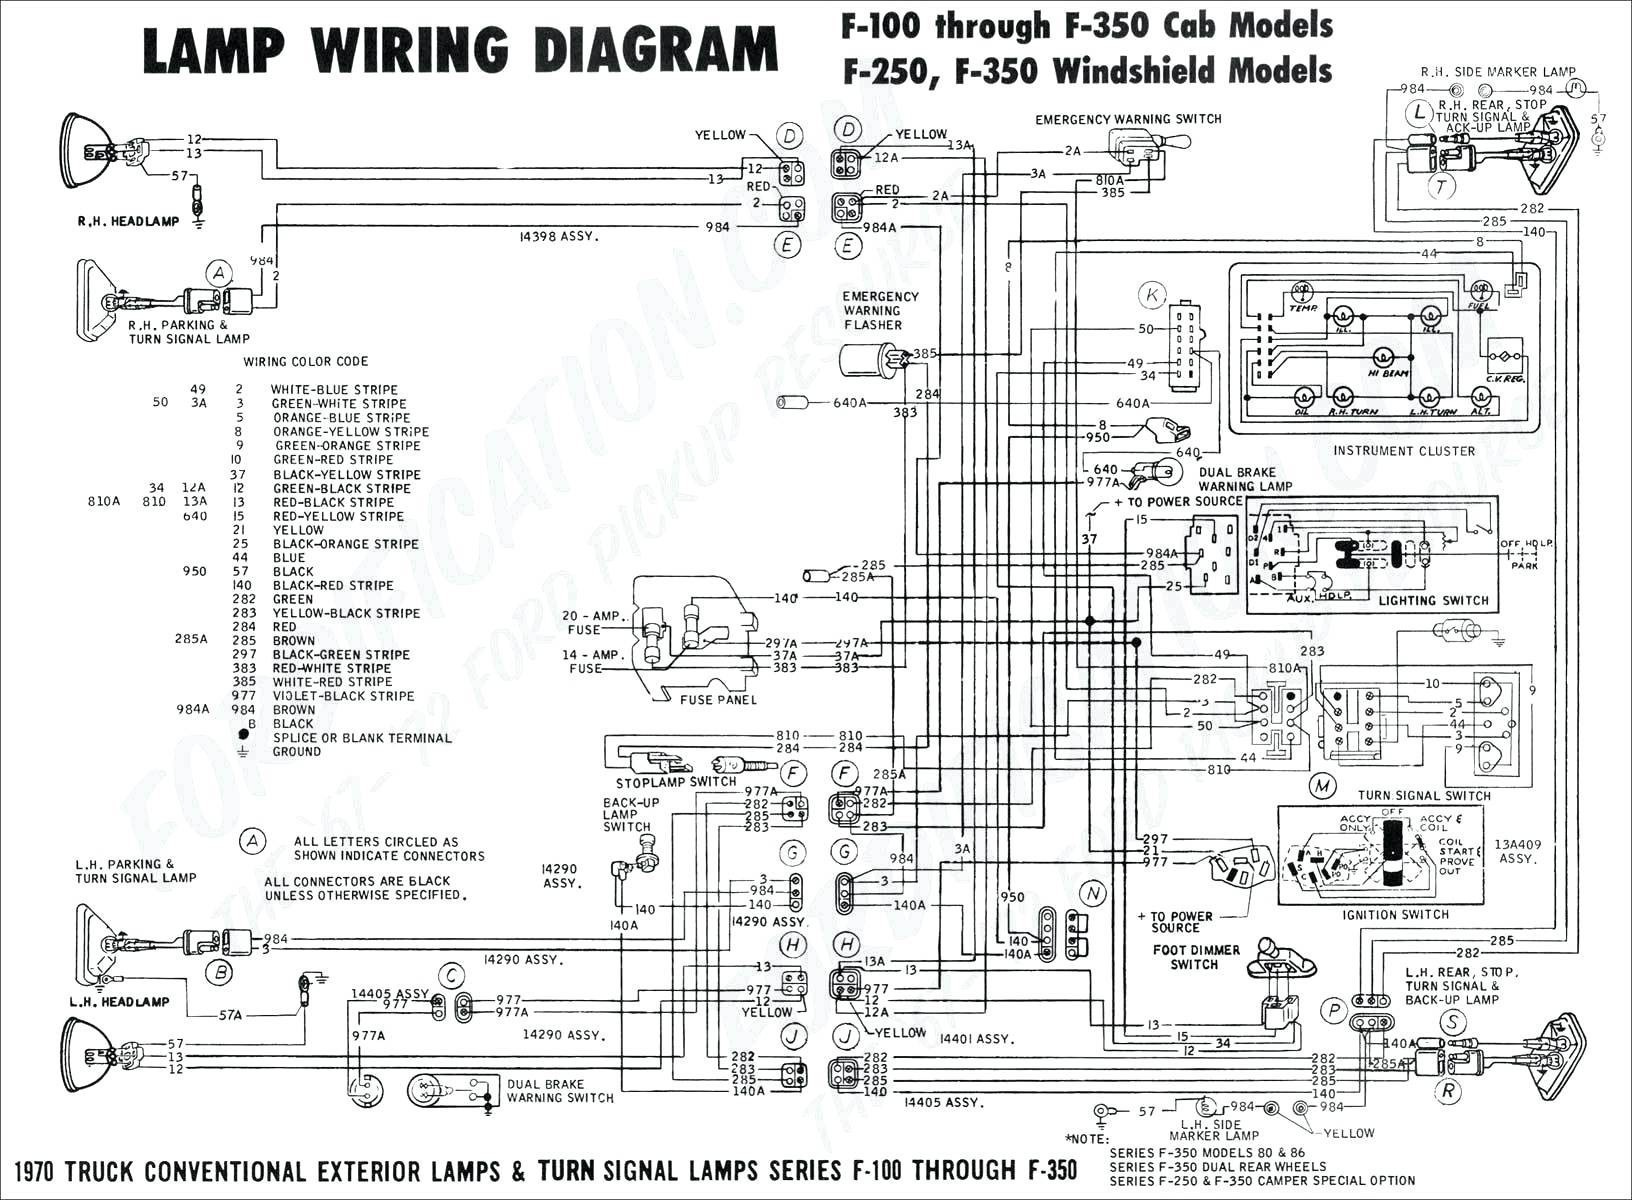 How Bike Engine Works with Diagram Dirt Bike Engine Diagram with Labels Wiring Diagram Datasource Of How Bike Engine Works with Diagram